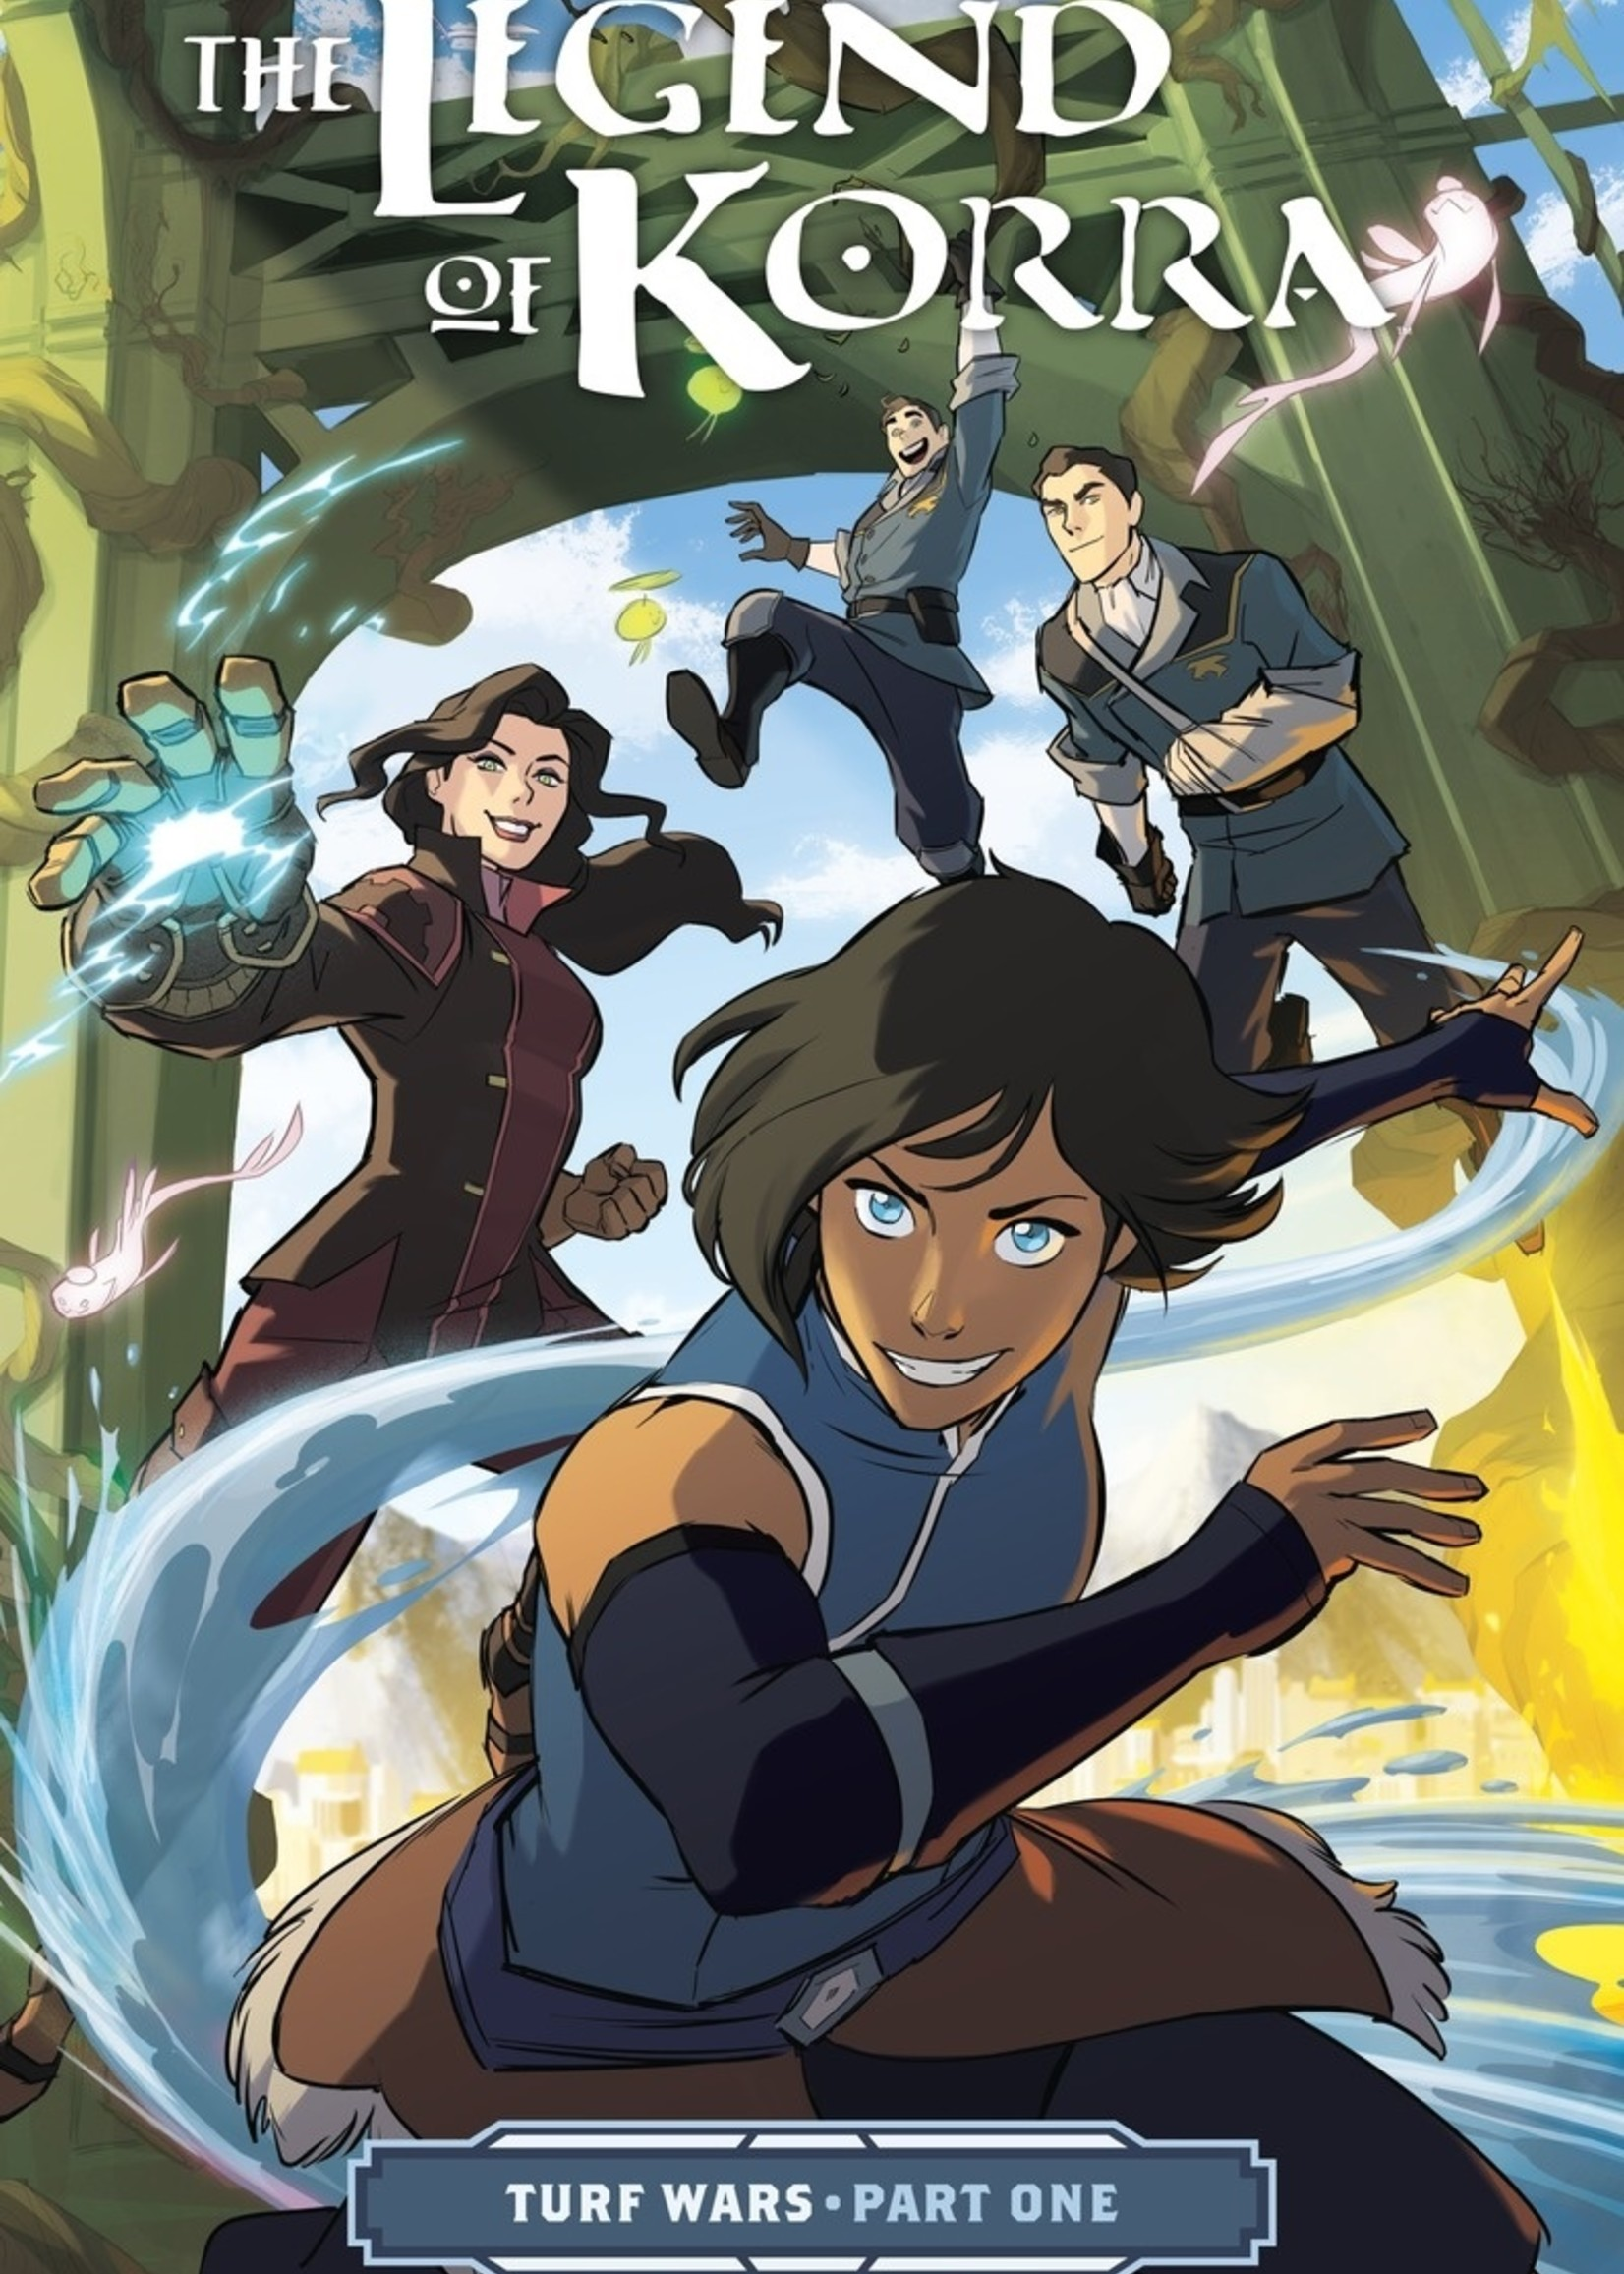 Dark Horse Comics The Legend of Korra Graphic Novel #01, Turf Wars Part 1 - Paperback